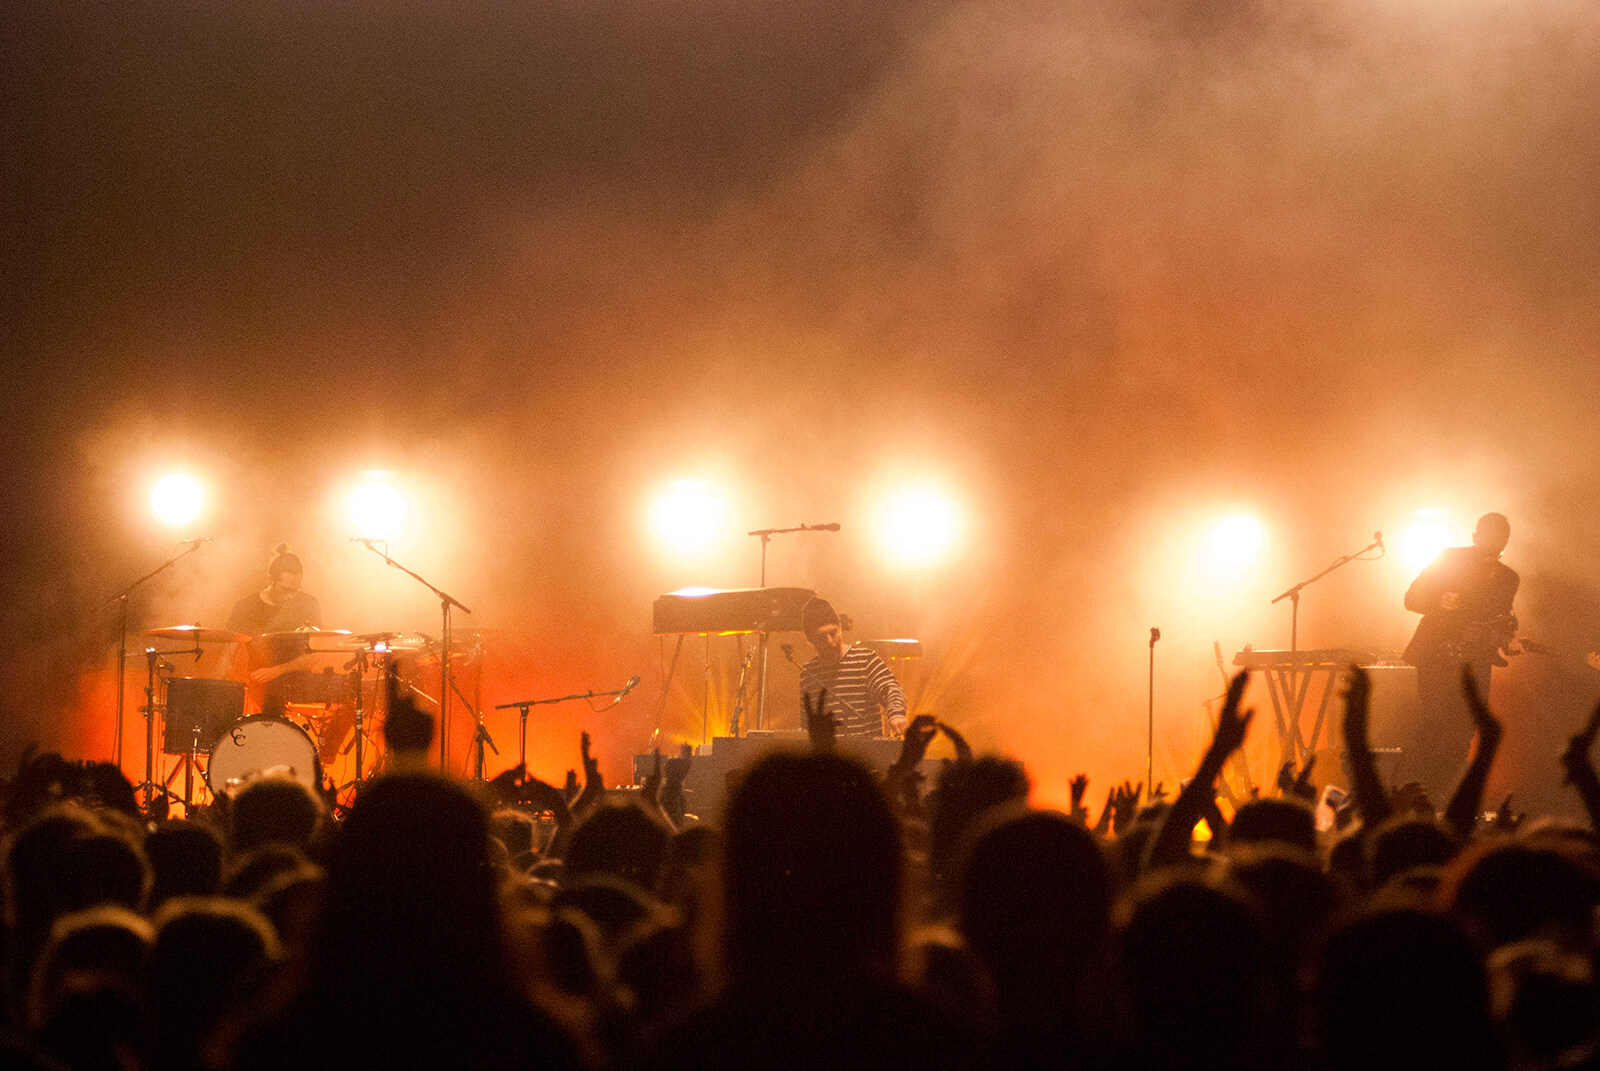 BERLIN FESTIVAL 2015 22